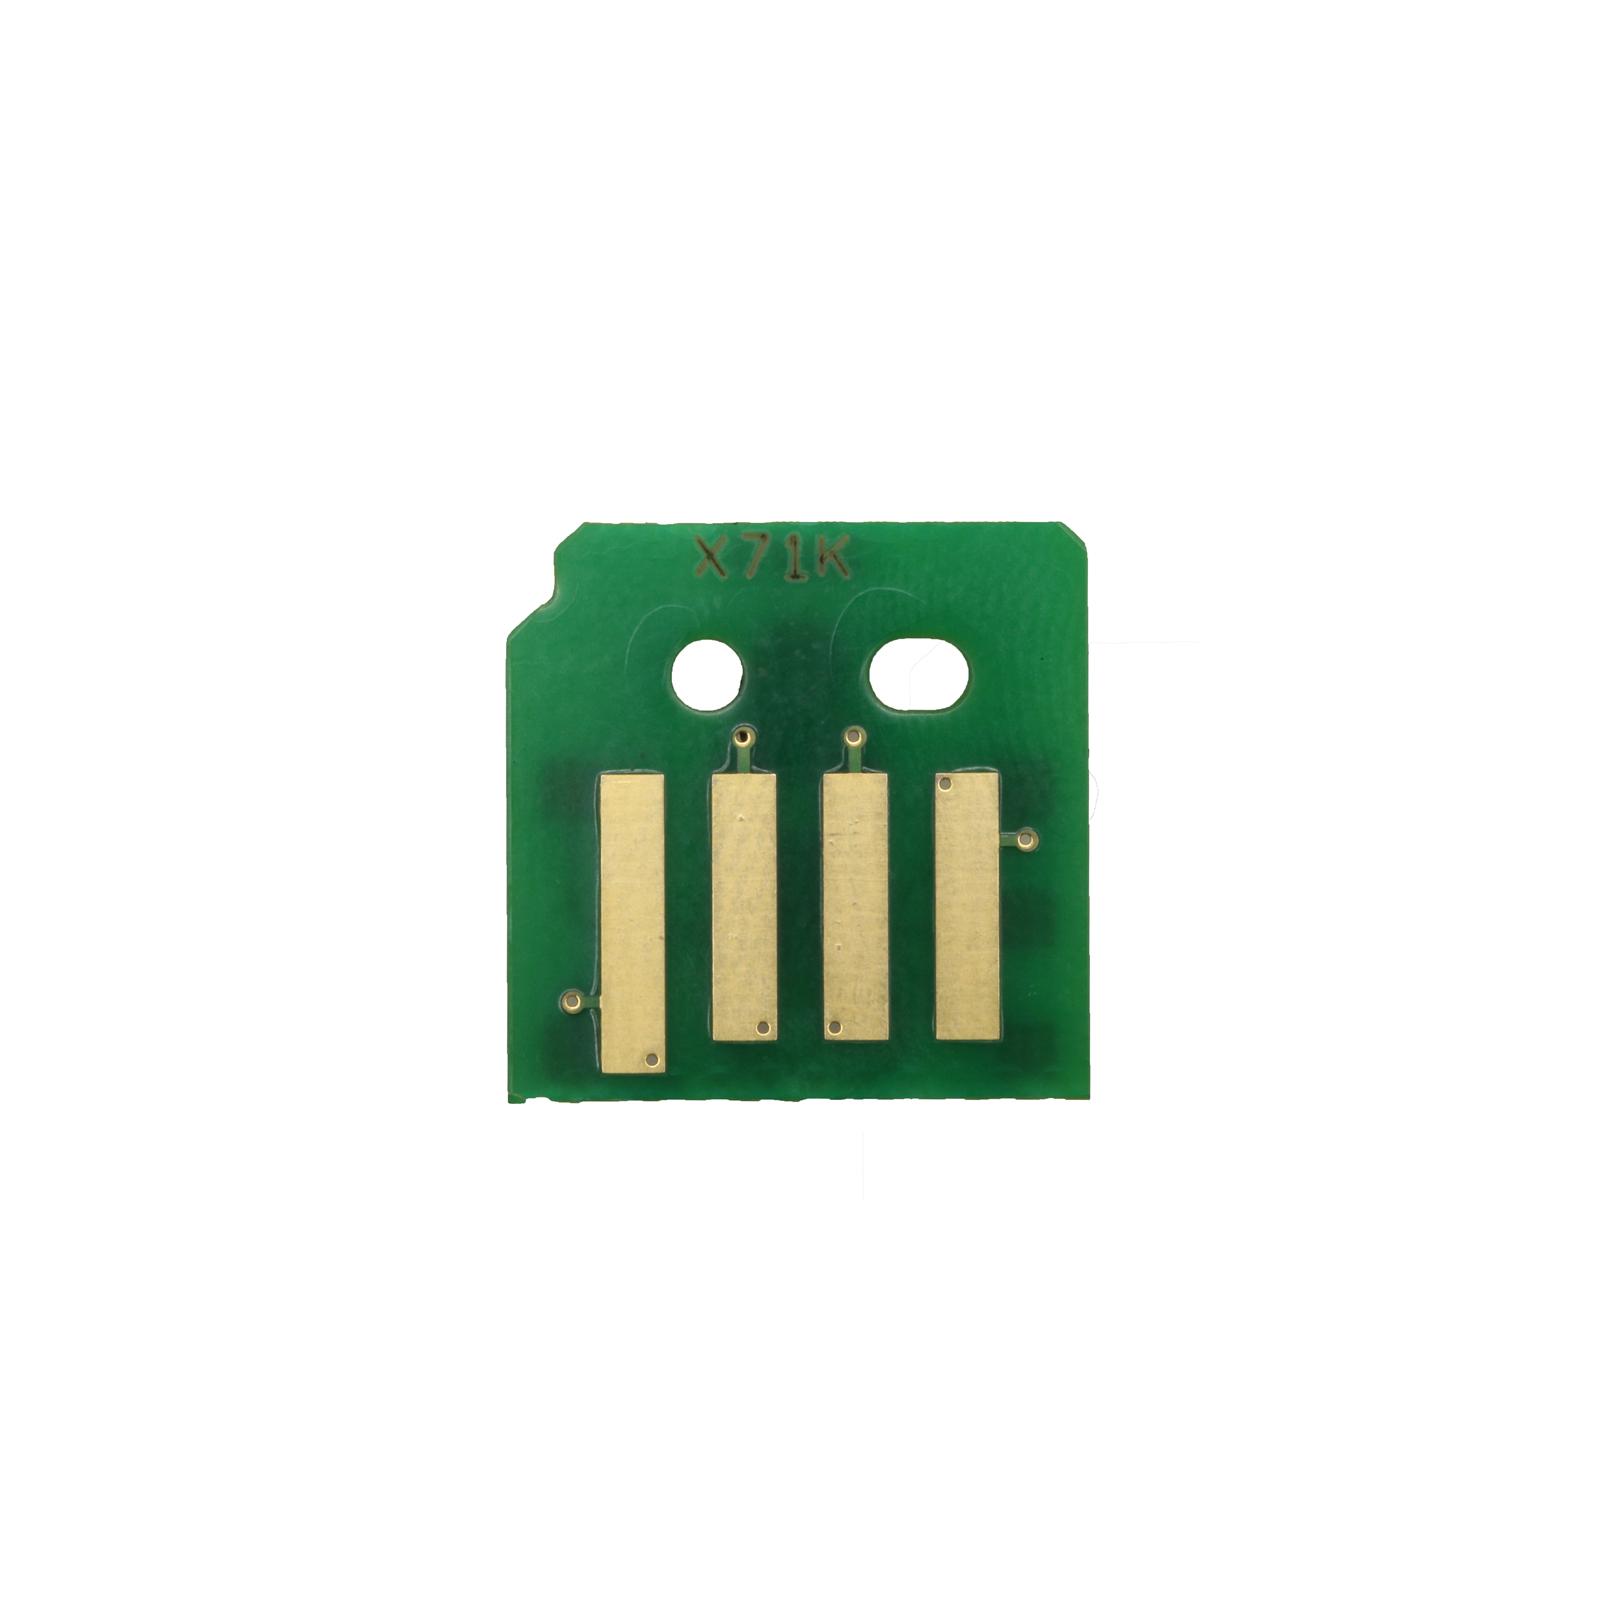 Чип для картриджа Xerox Phaser 7800 (106R01572) 17.2k yellow Static Control (X7800CP-YLA)